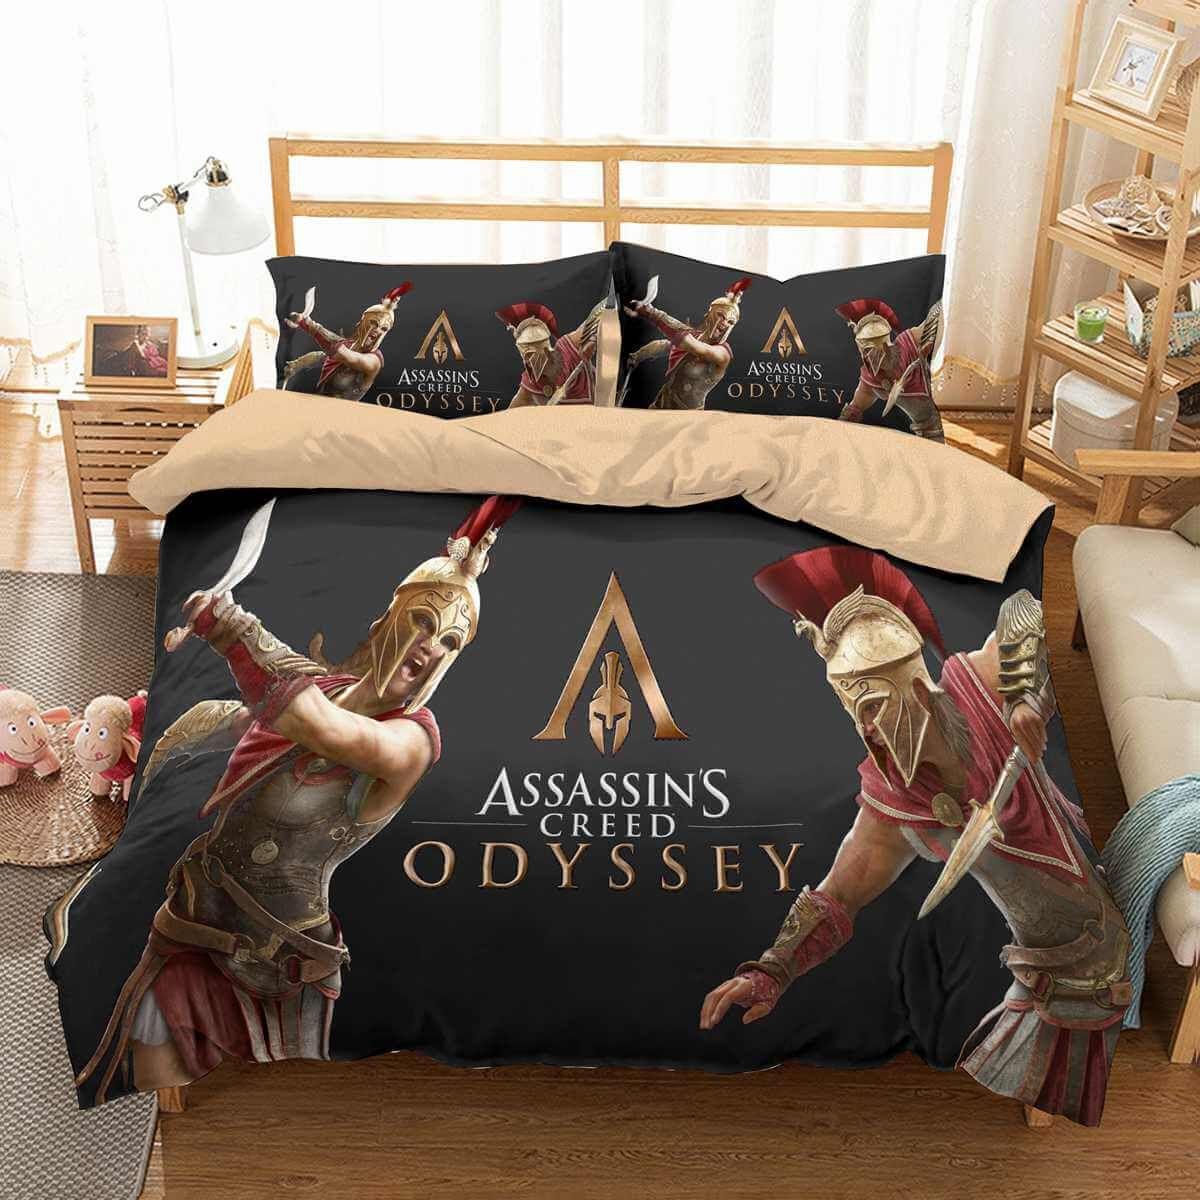 3d Customize Assassin S Creed Odyssey Bedding Set Duvet Cover Set Bedroom Set Bedlinen Duvet